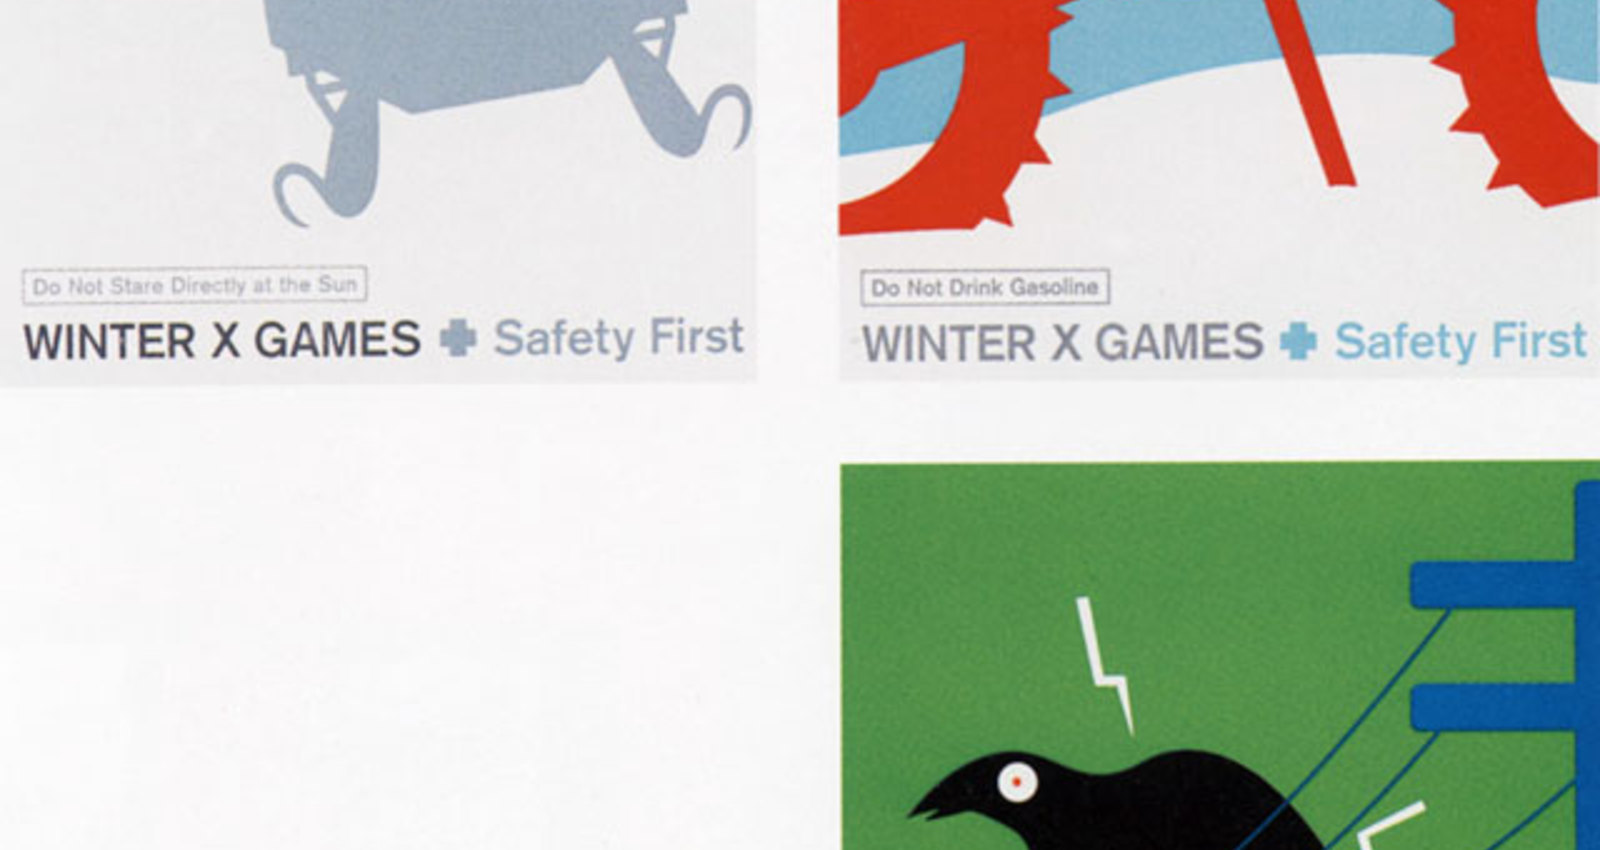 Safety First : Bear, Bunny, Squirrel, Bird